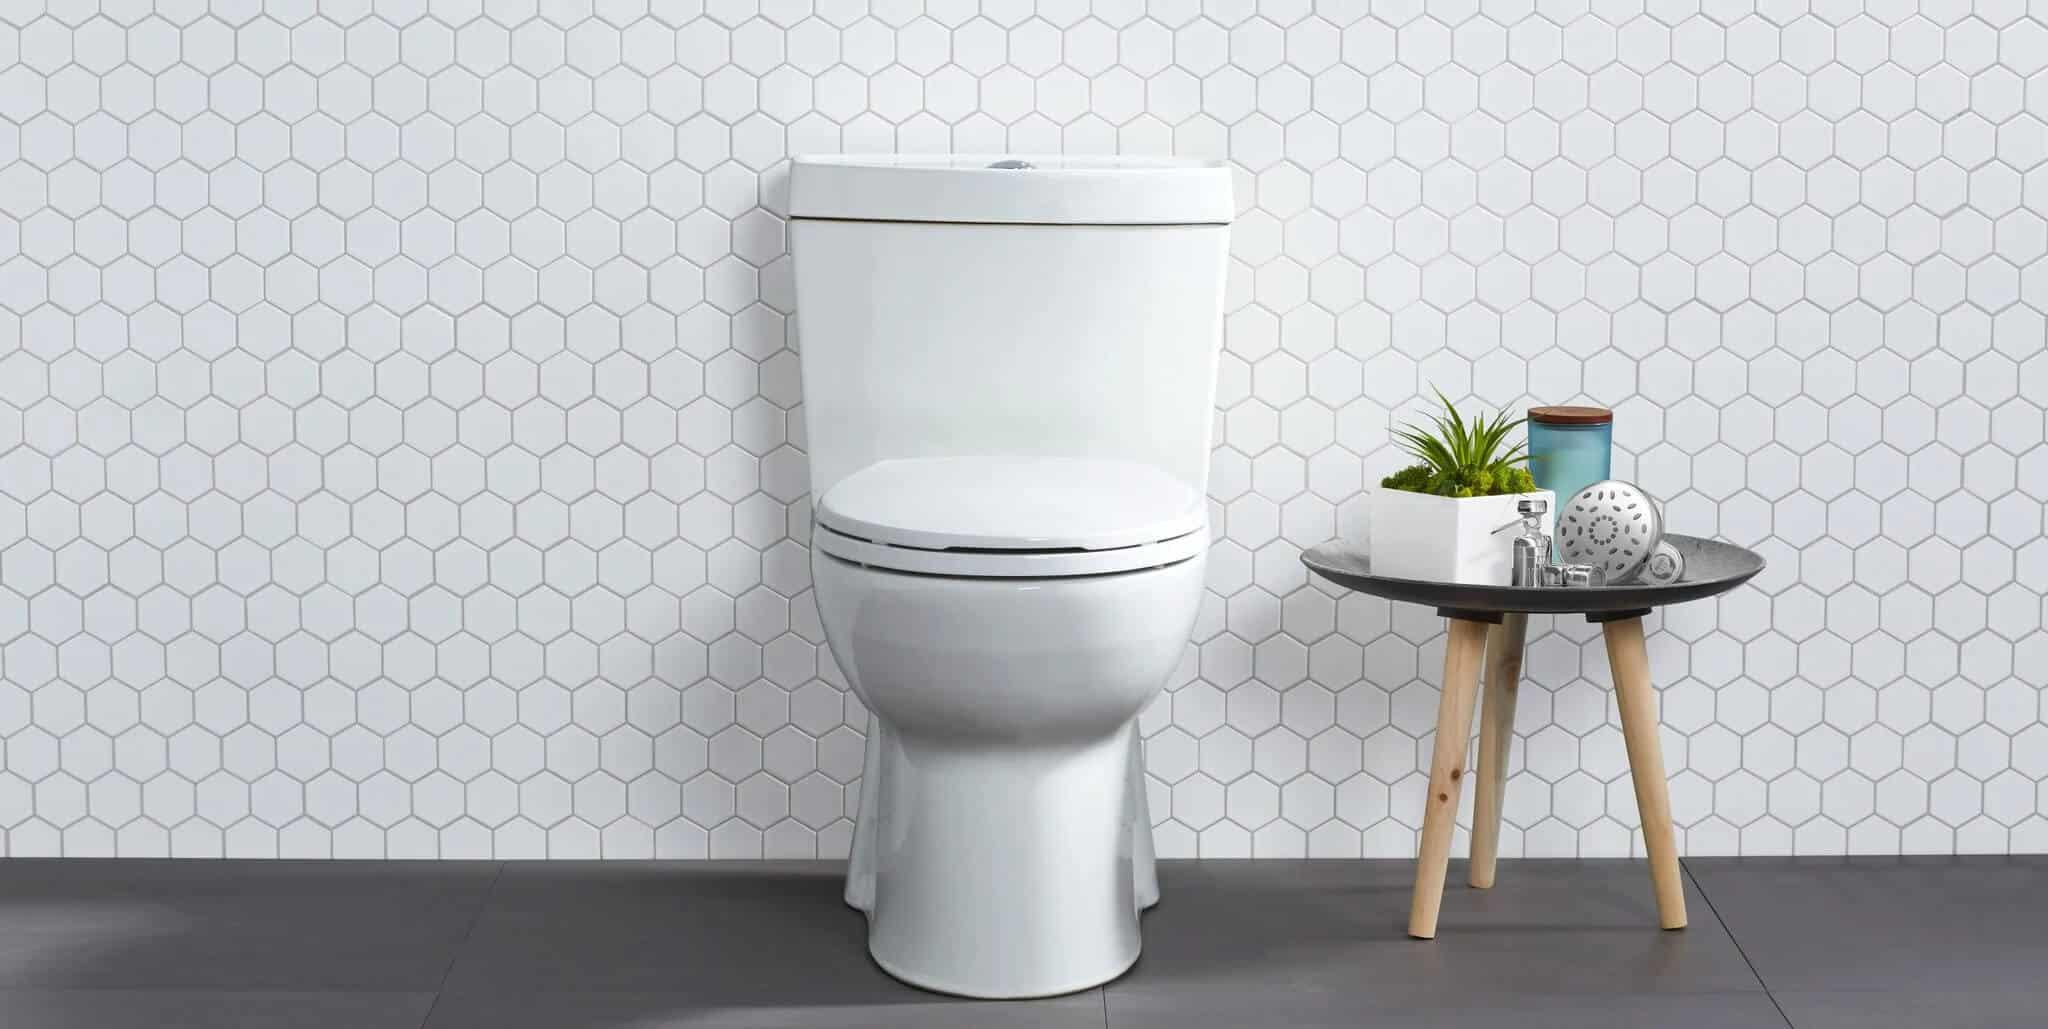 Best-Pressure-Assist-Toilets-333